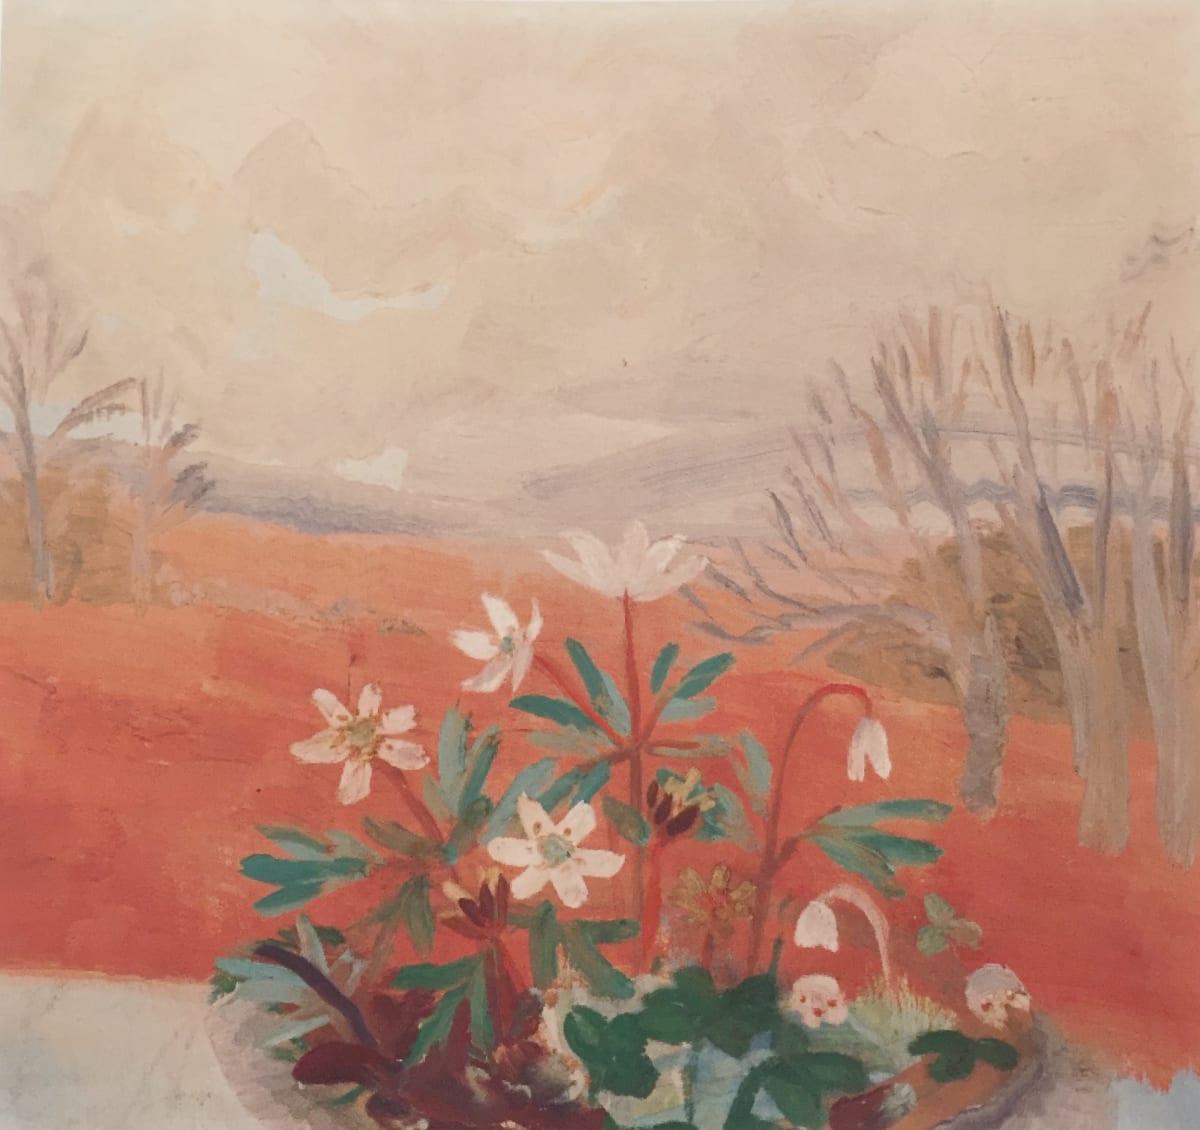 Winifred NICHOLSON (1893 – 1981) Windflowers, 1934 Oil on board 13 x 14 ¼ inches / 33 x 36 cm